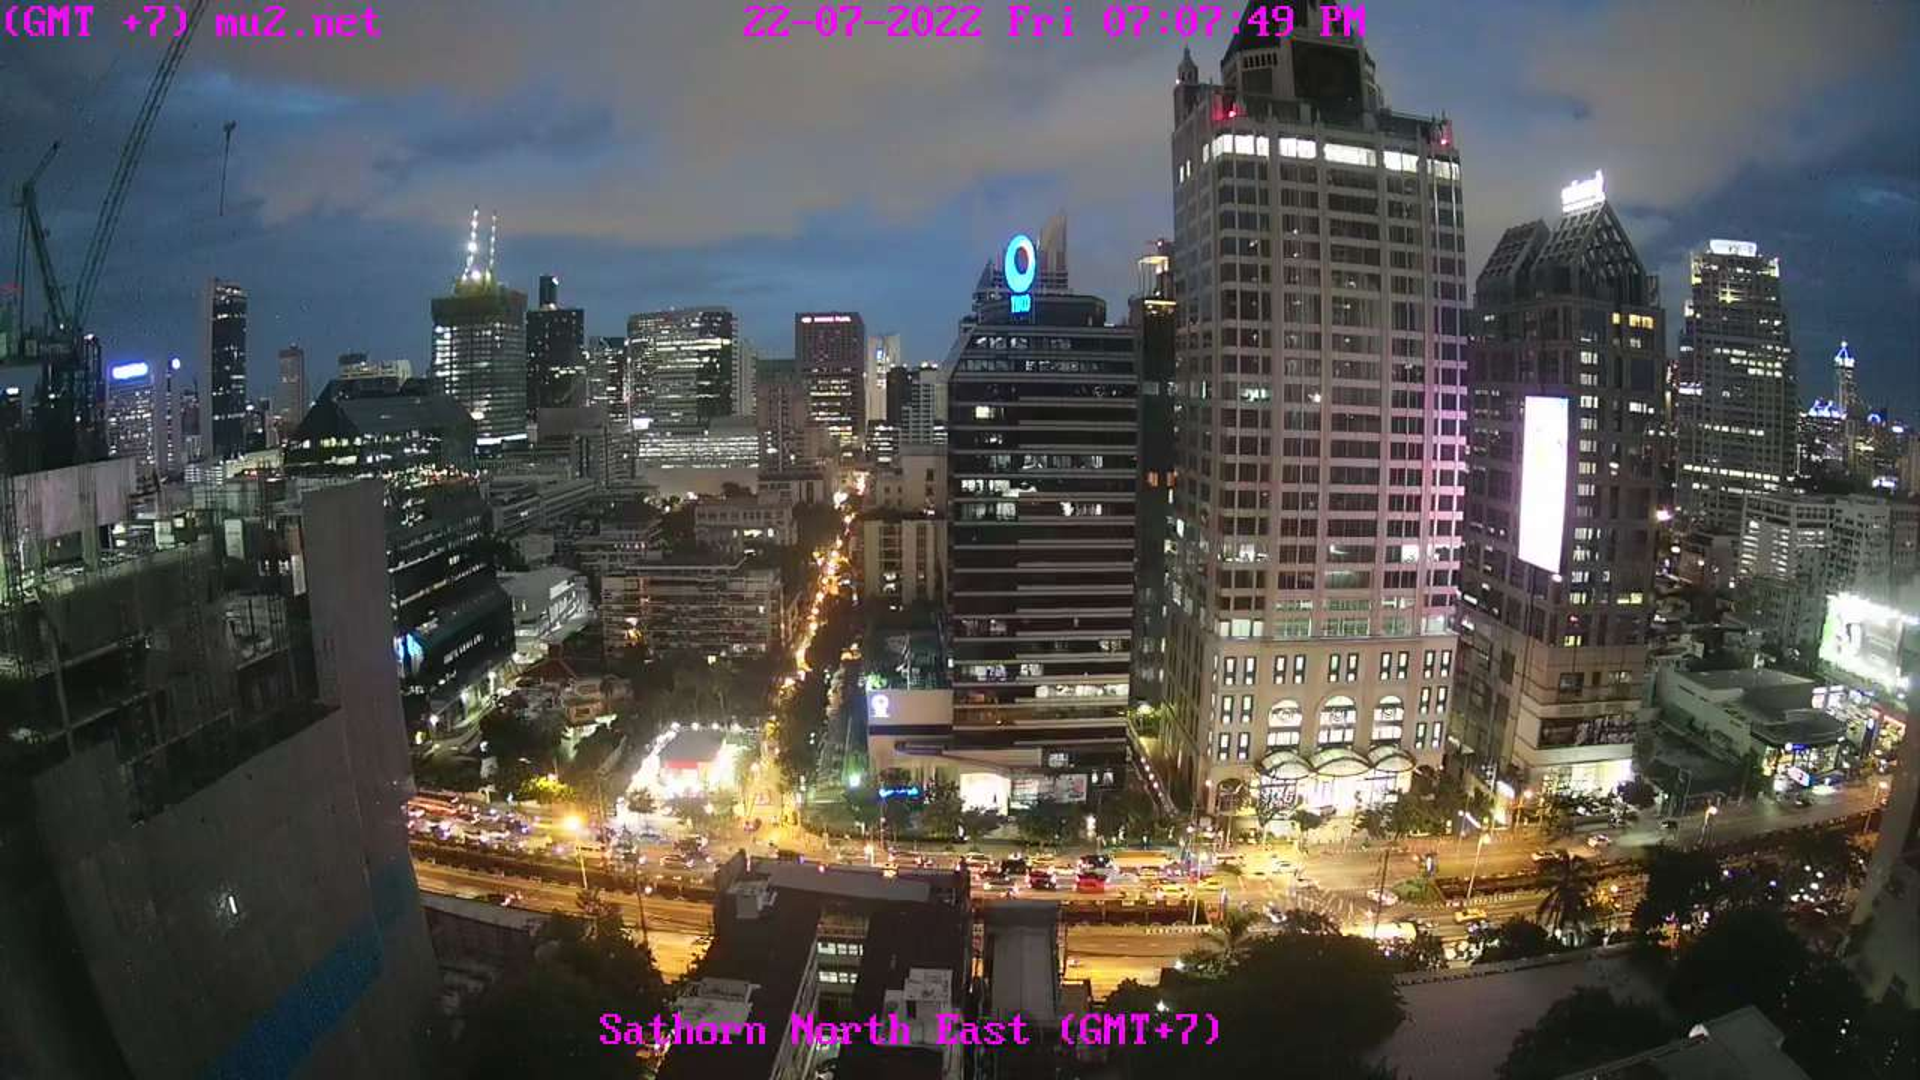 Bangkok Mon. 19:09